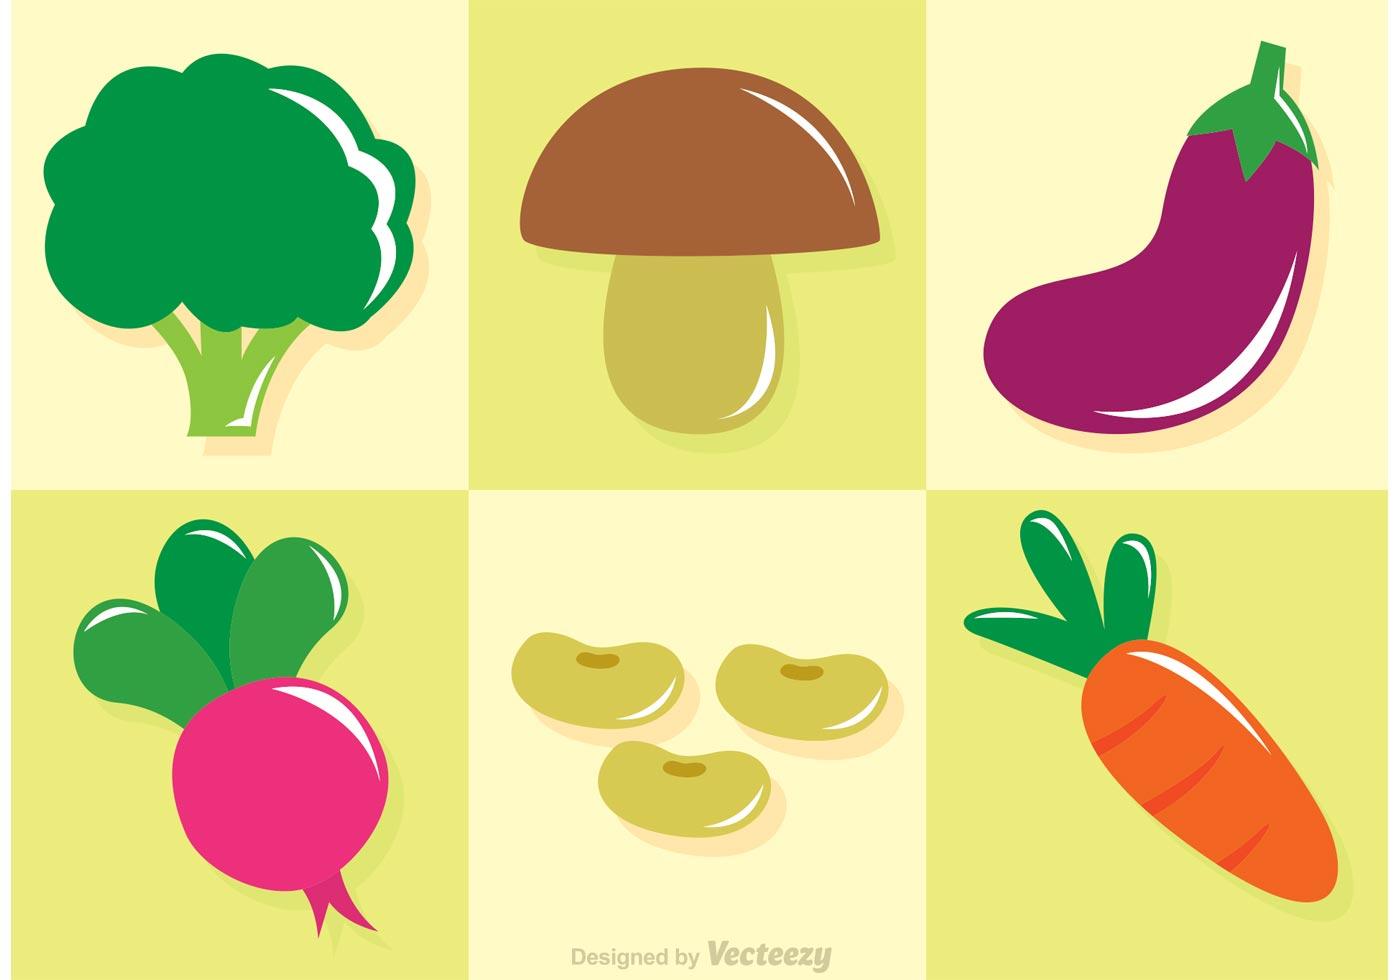 Fresh Shiny Vegetable Vectors - Download Free Vector Art ...